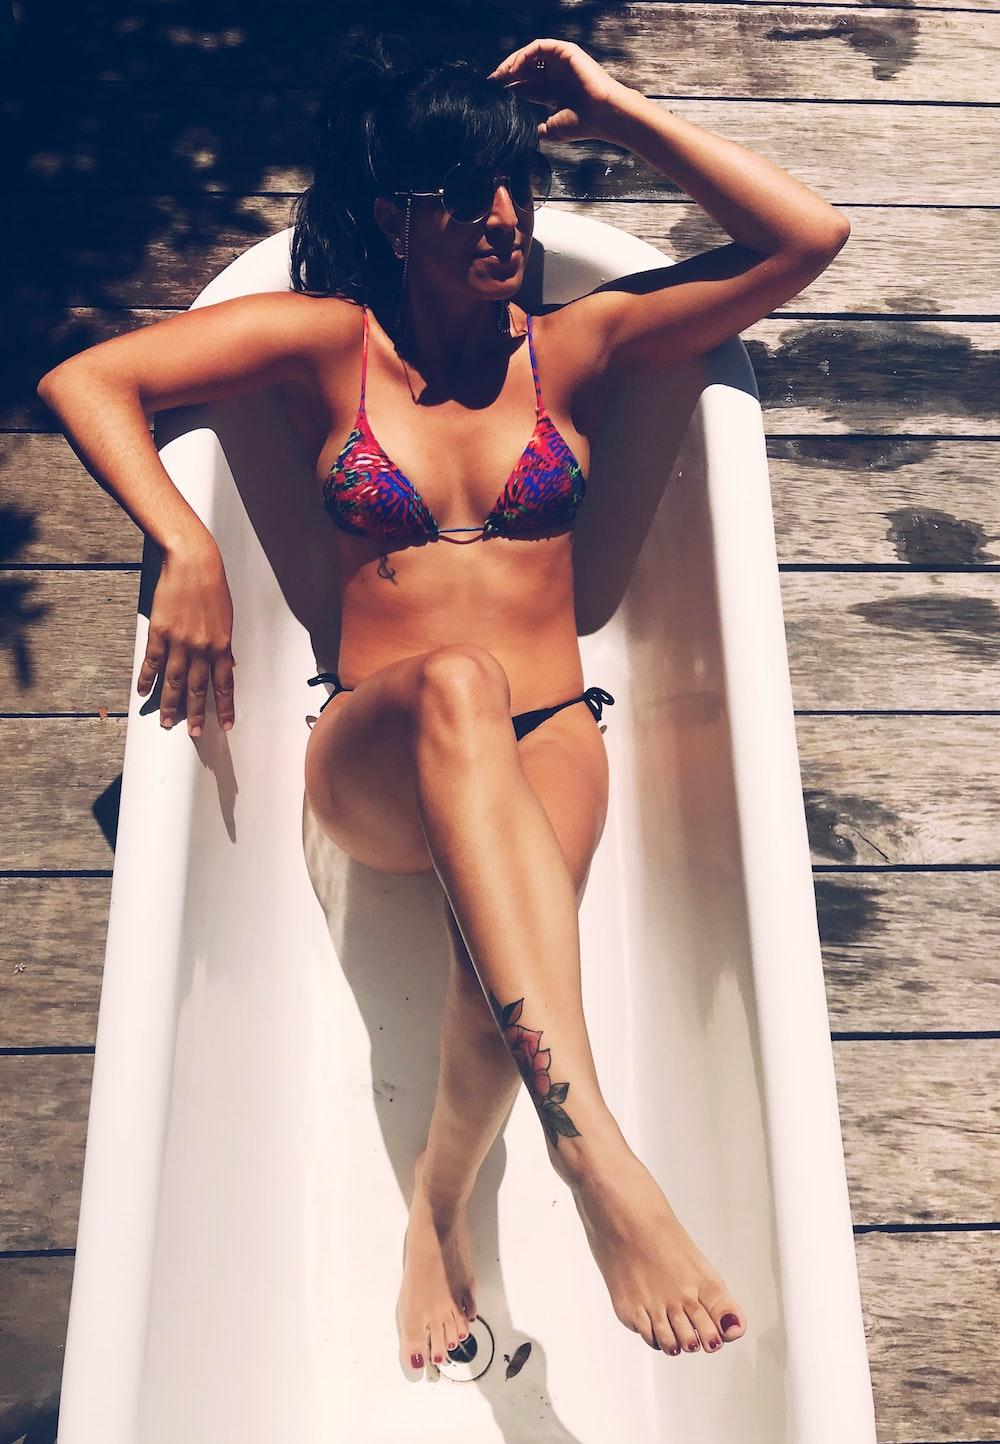 woman wearing purple bikini sitting on white ceramic bath tub